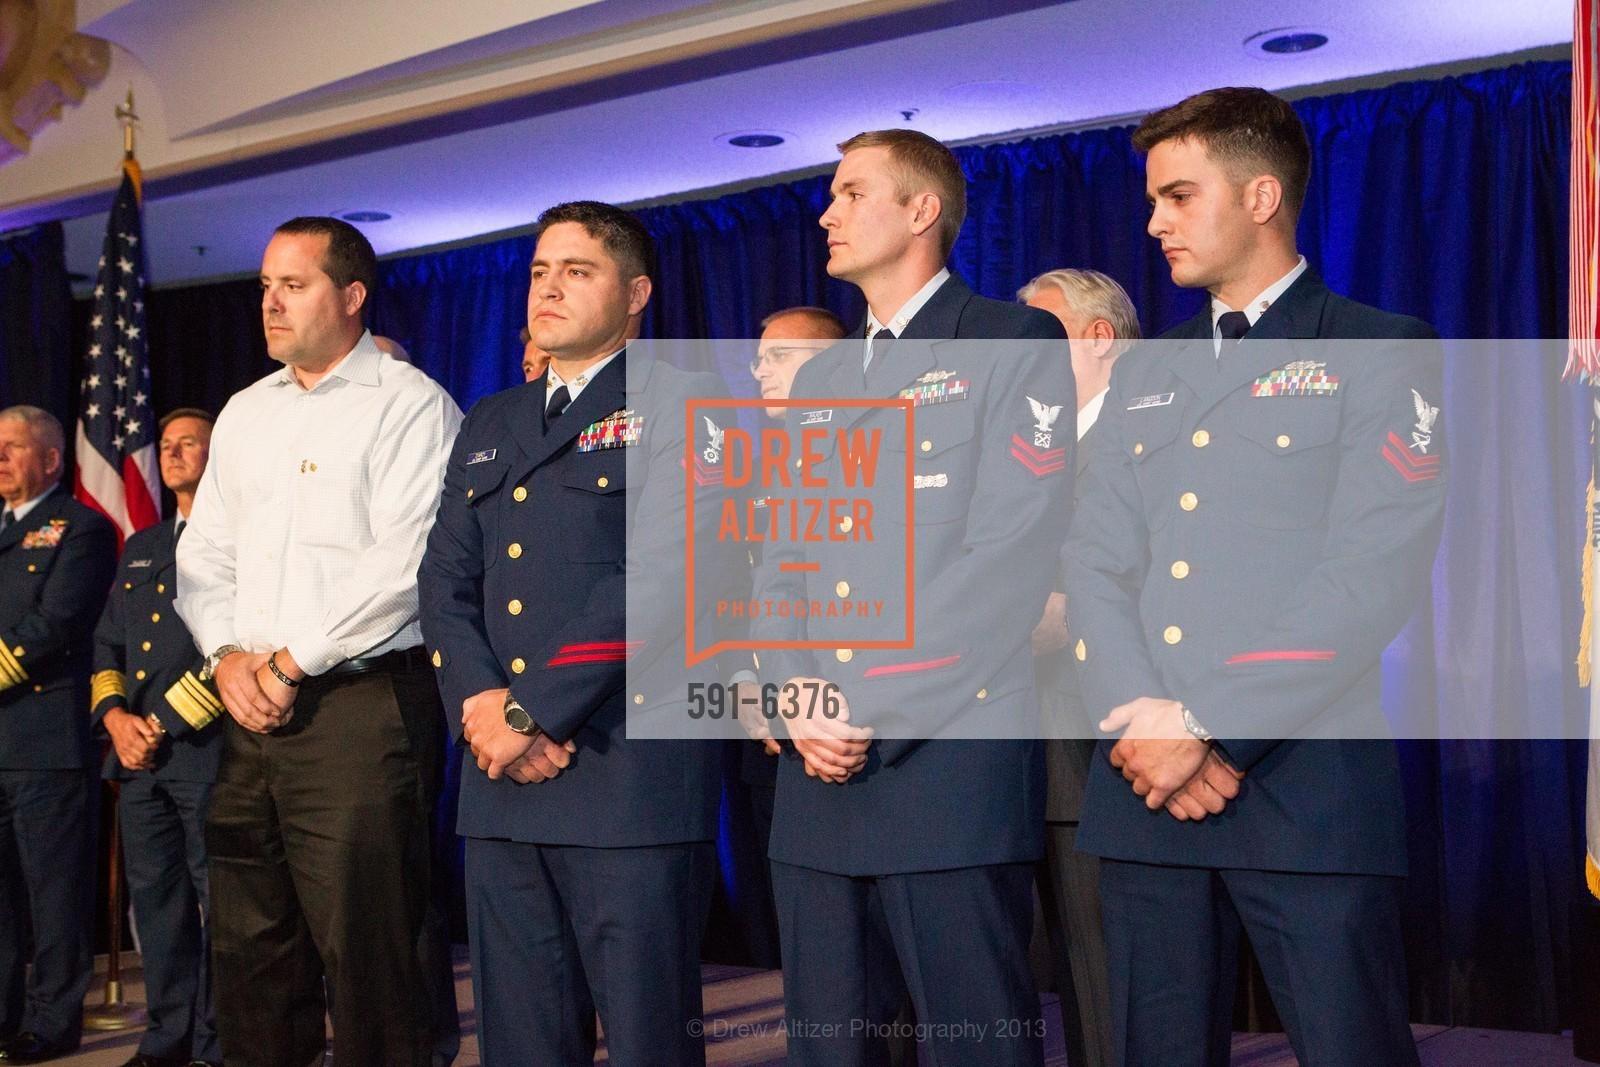 Sean Kuipers, Jonathan D'Arcy, Michael Walker, Brandon Langdon, COAST GUARD FOUNDATION Presents Pacific Awards Dinner, US, April 25th, 2013